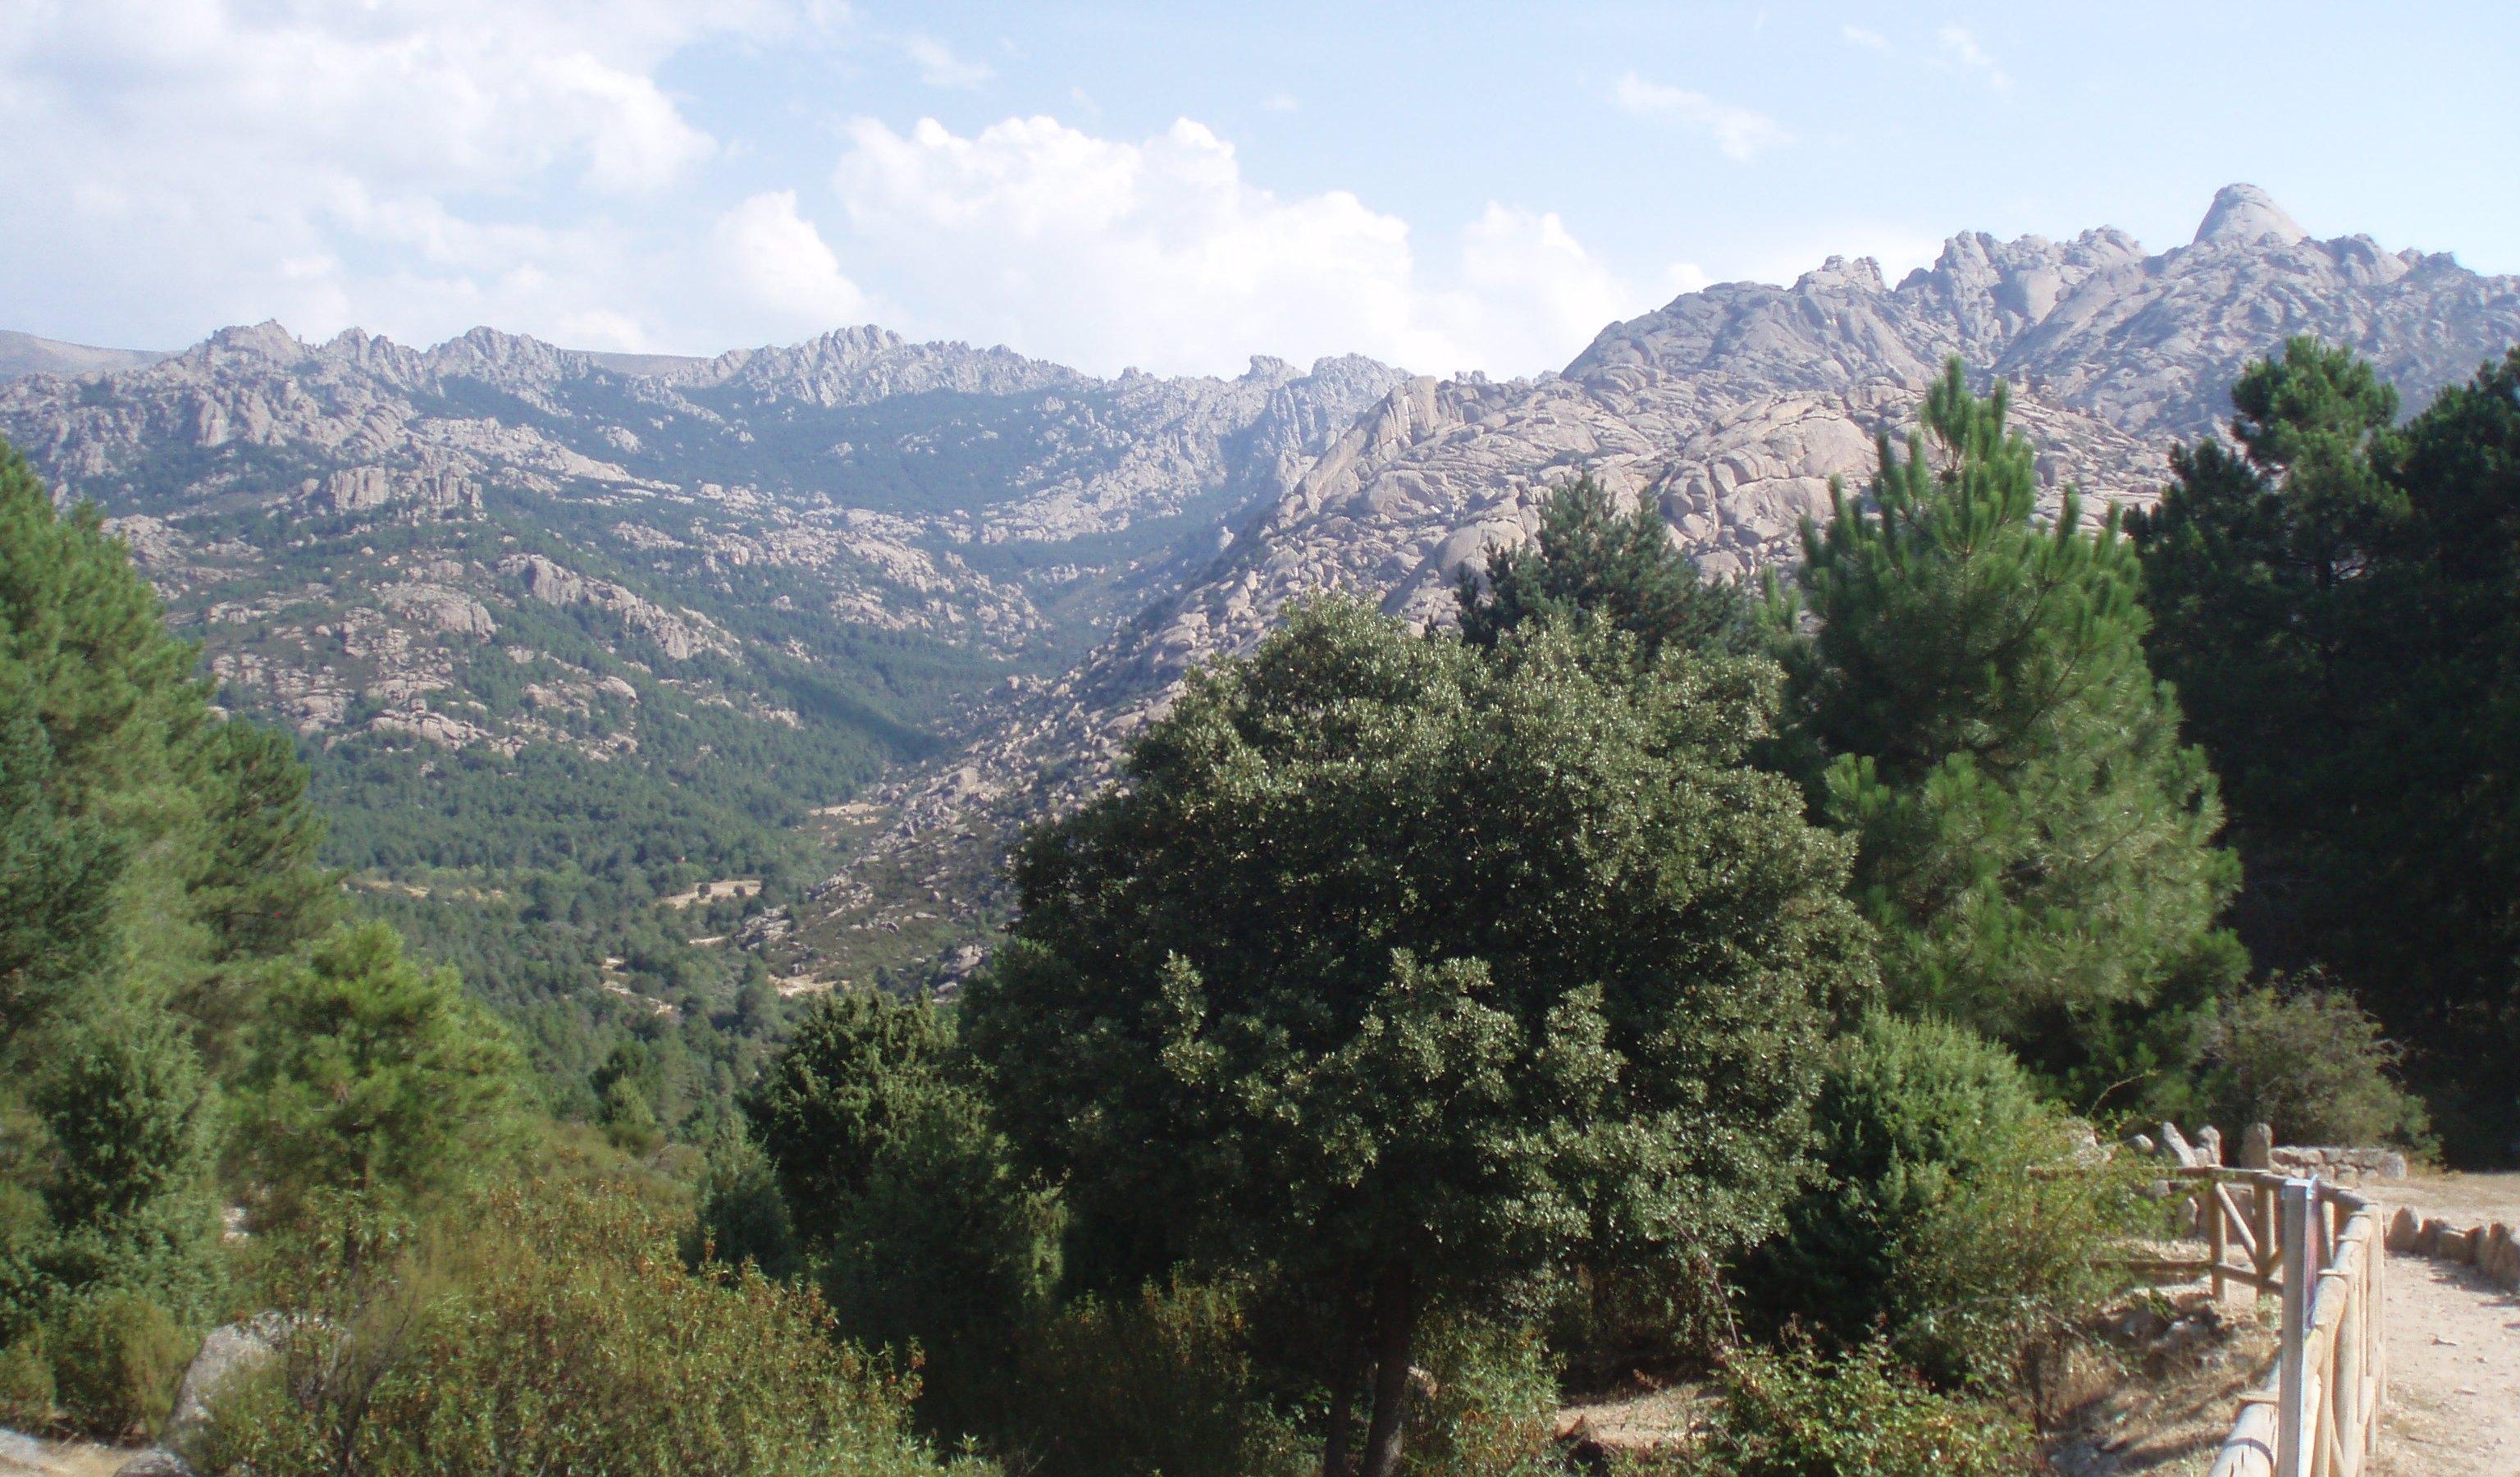 Vista general de La Pedriza.